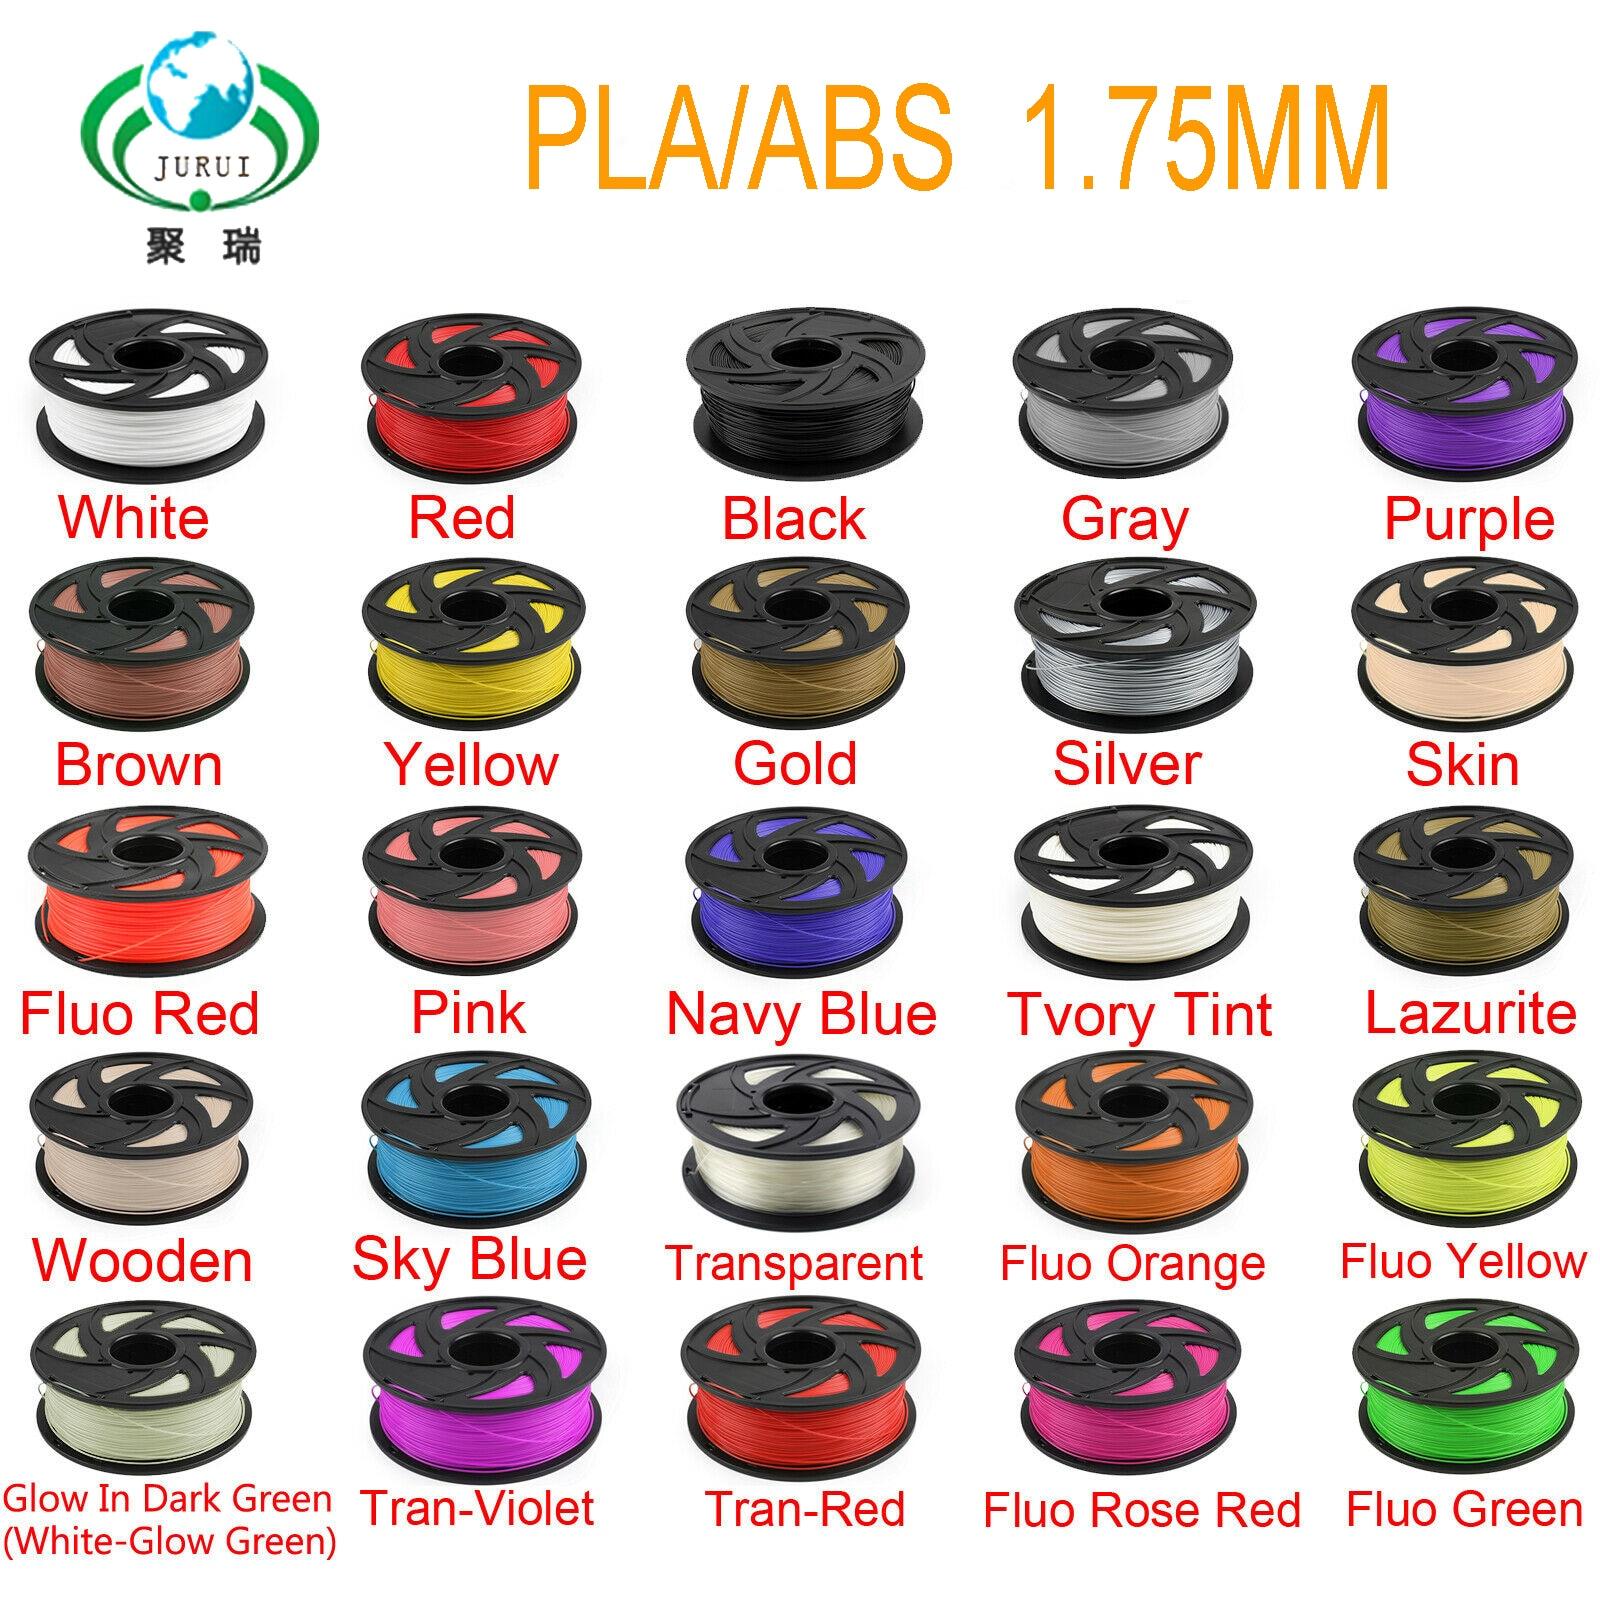 JURUI PLA/ABS 3d drucker filament heizung 1,75 1 kg/rolle PLA/ABS 3d drucker spulen